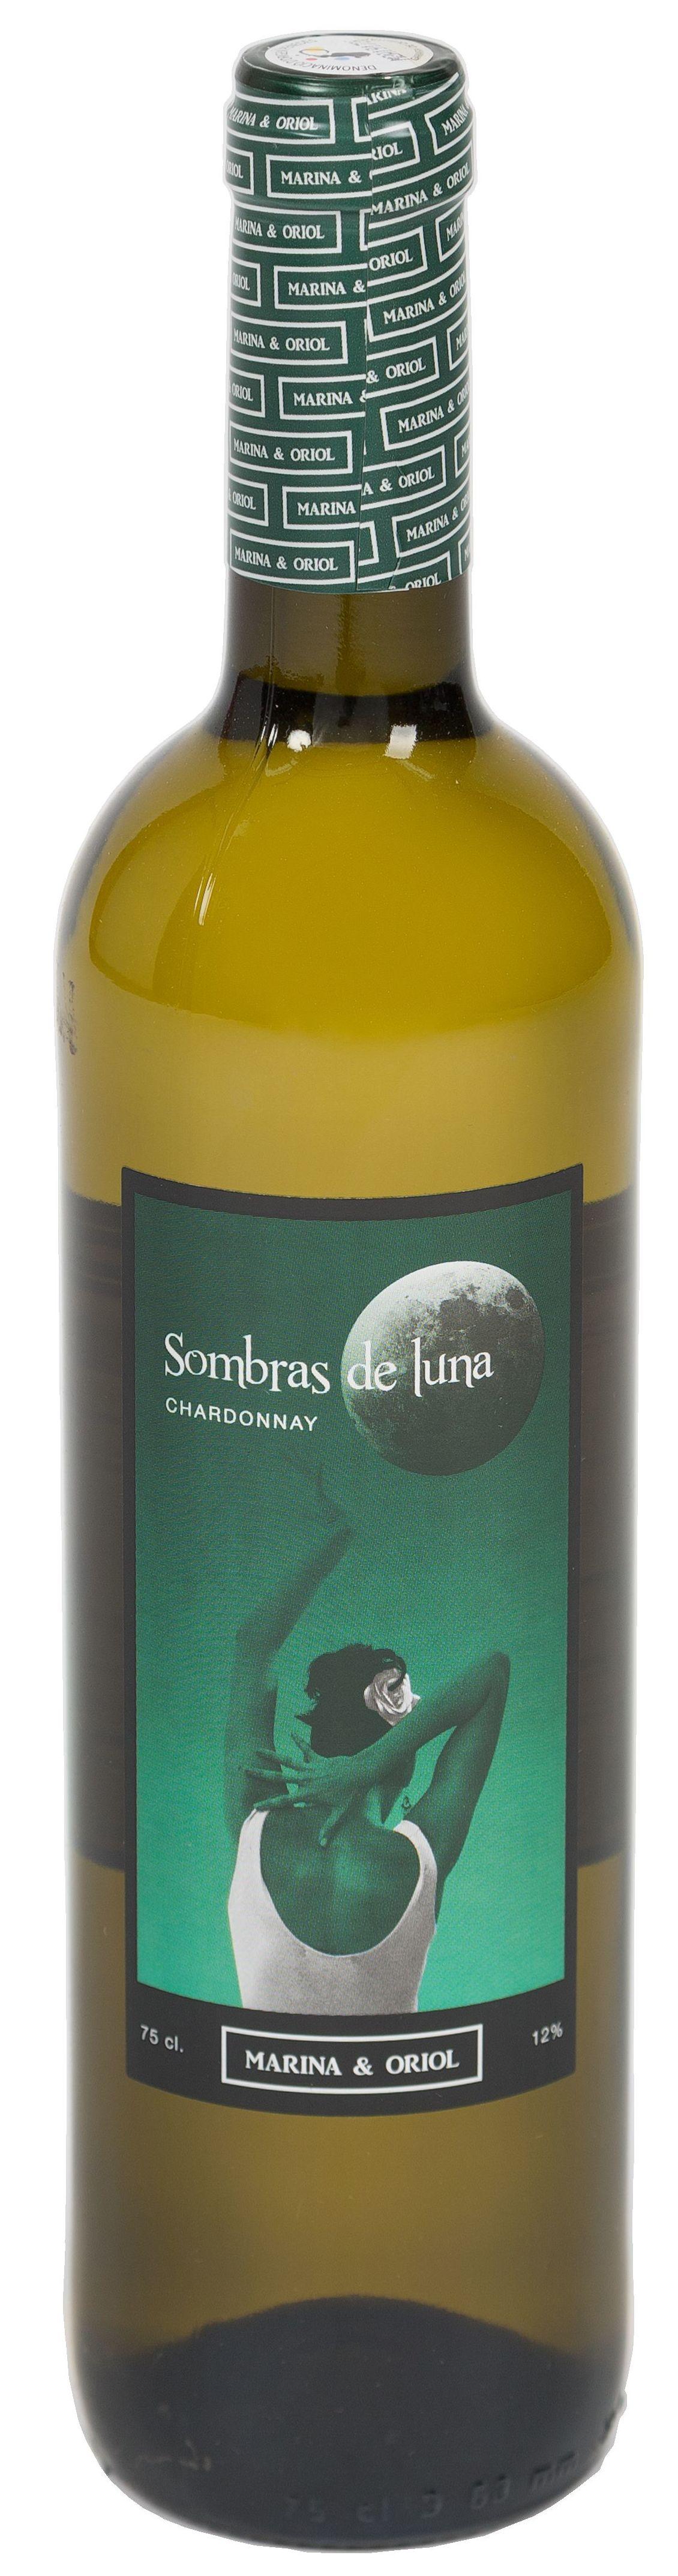 Vino Blanco Varietal D.O. Penedés SOMBRAS DE LUNA: Productos de Rexgosa®